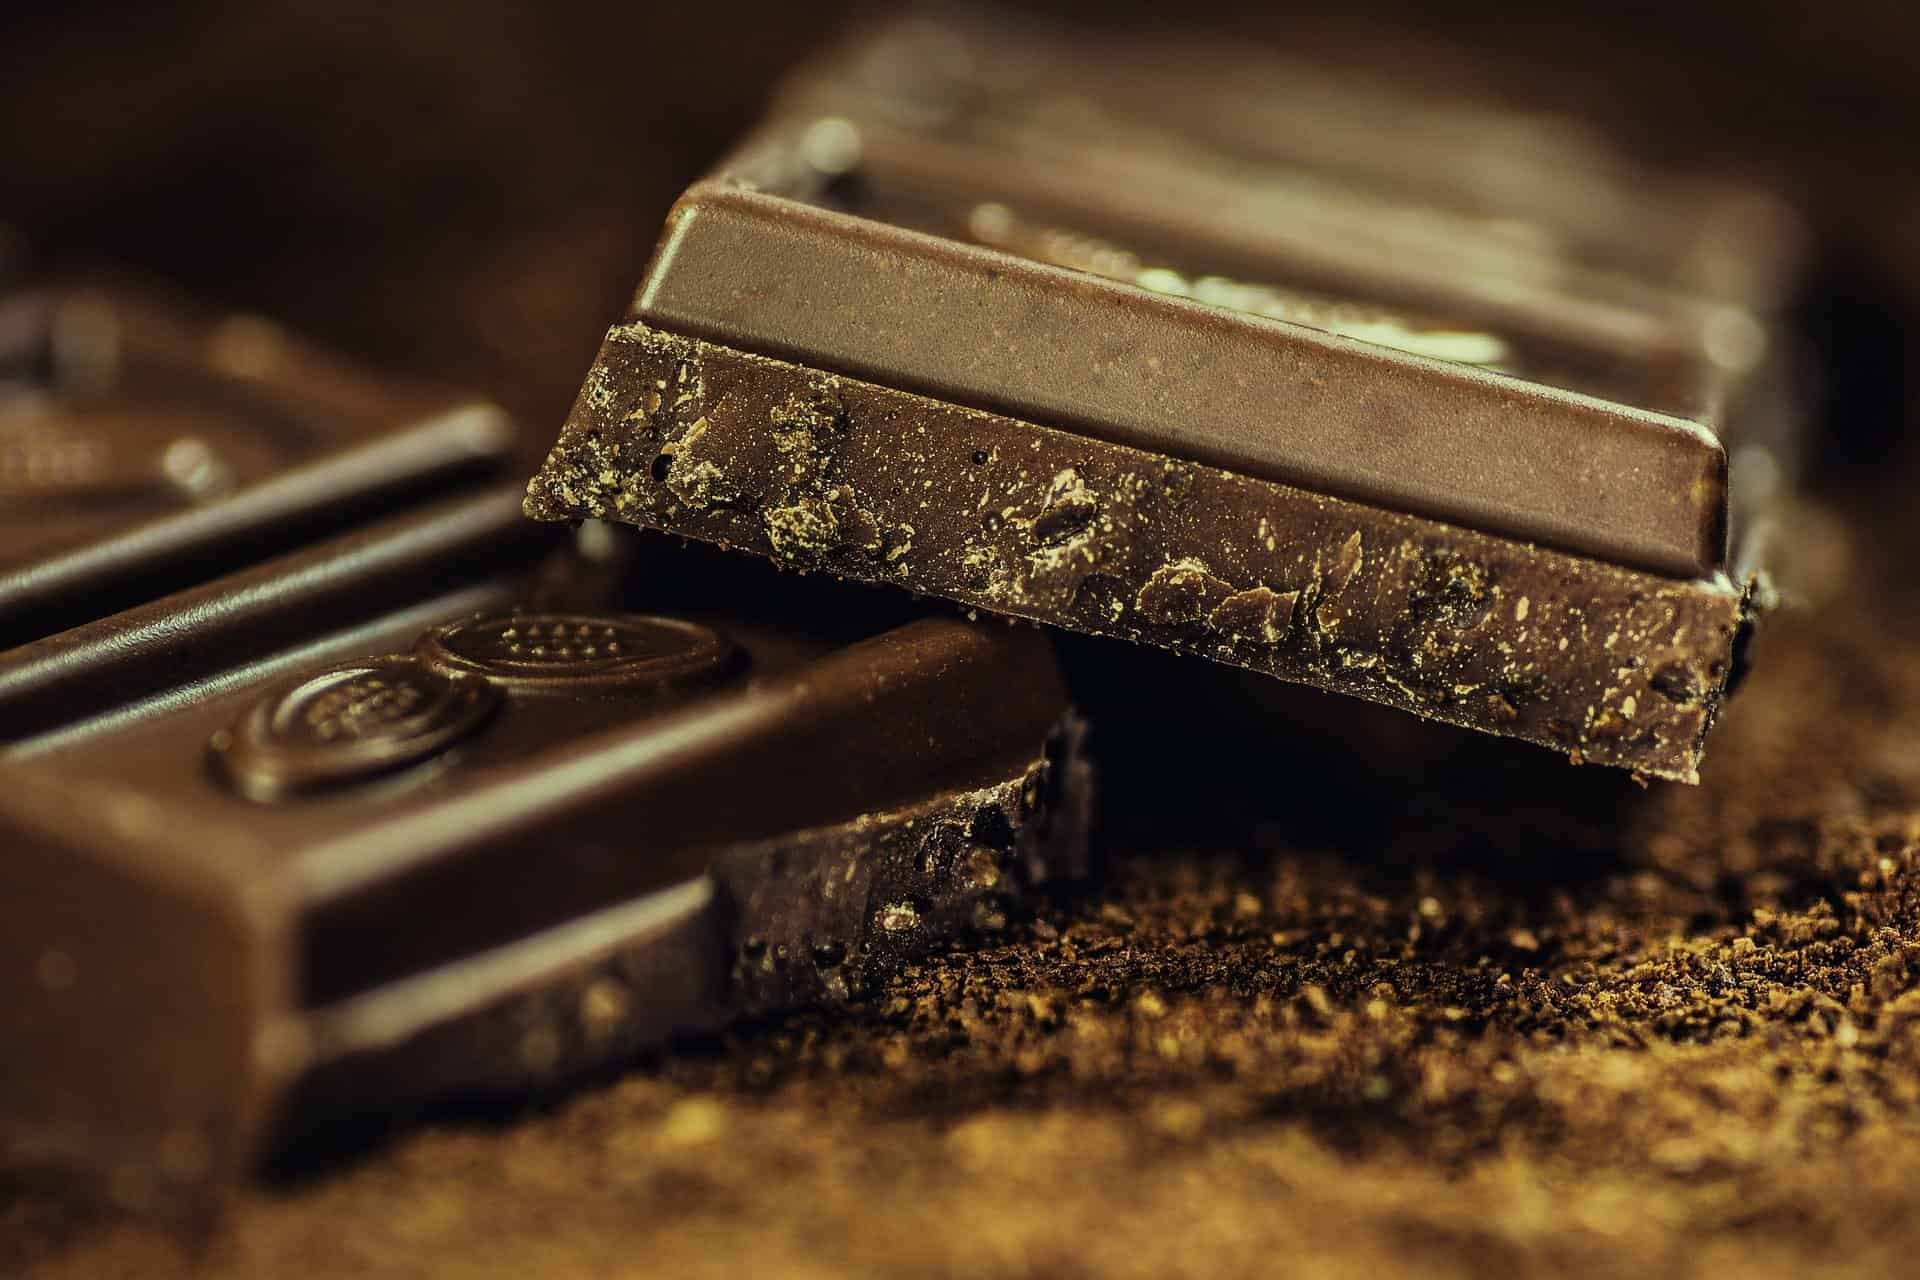 Schokolade in Großaufnahme. /pixabay